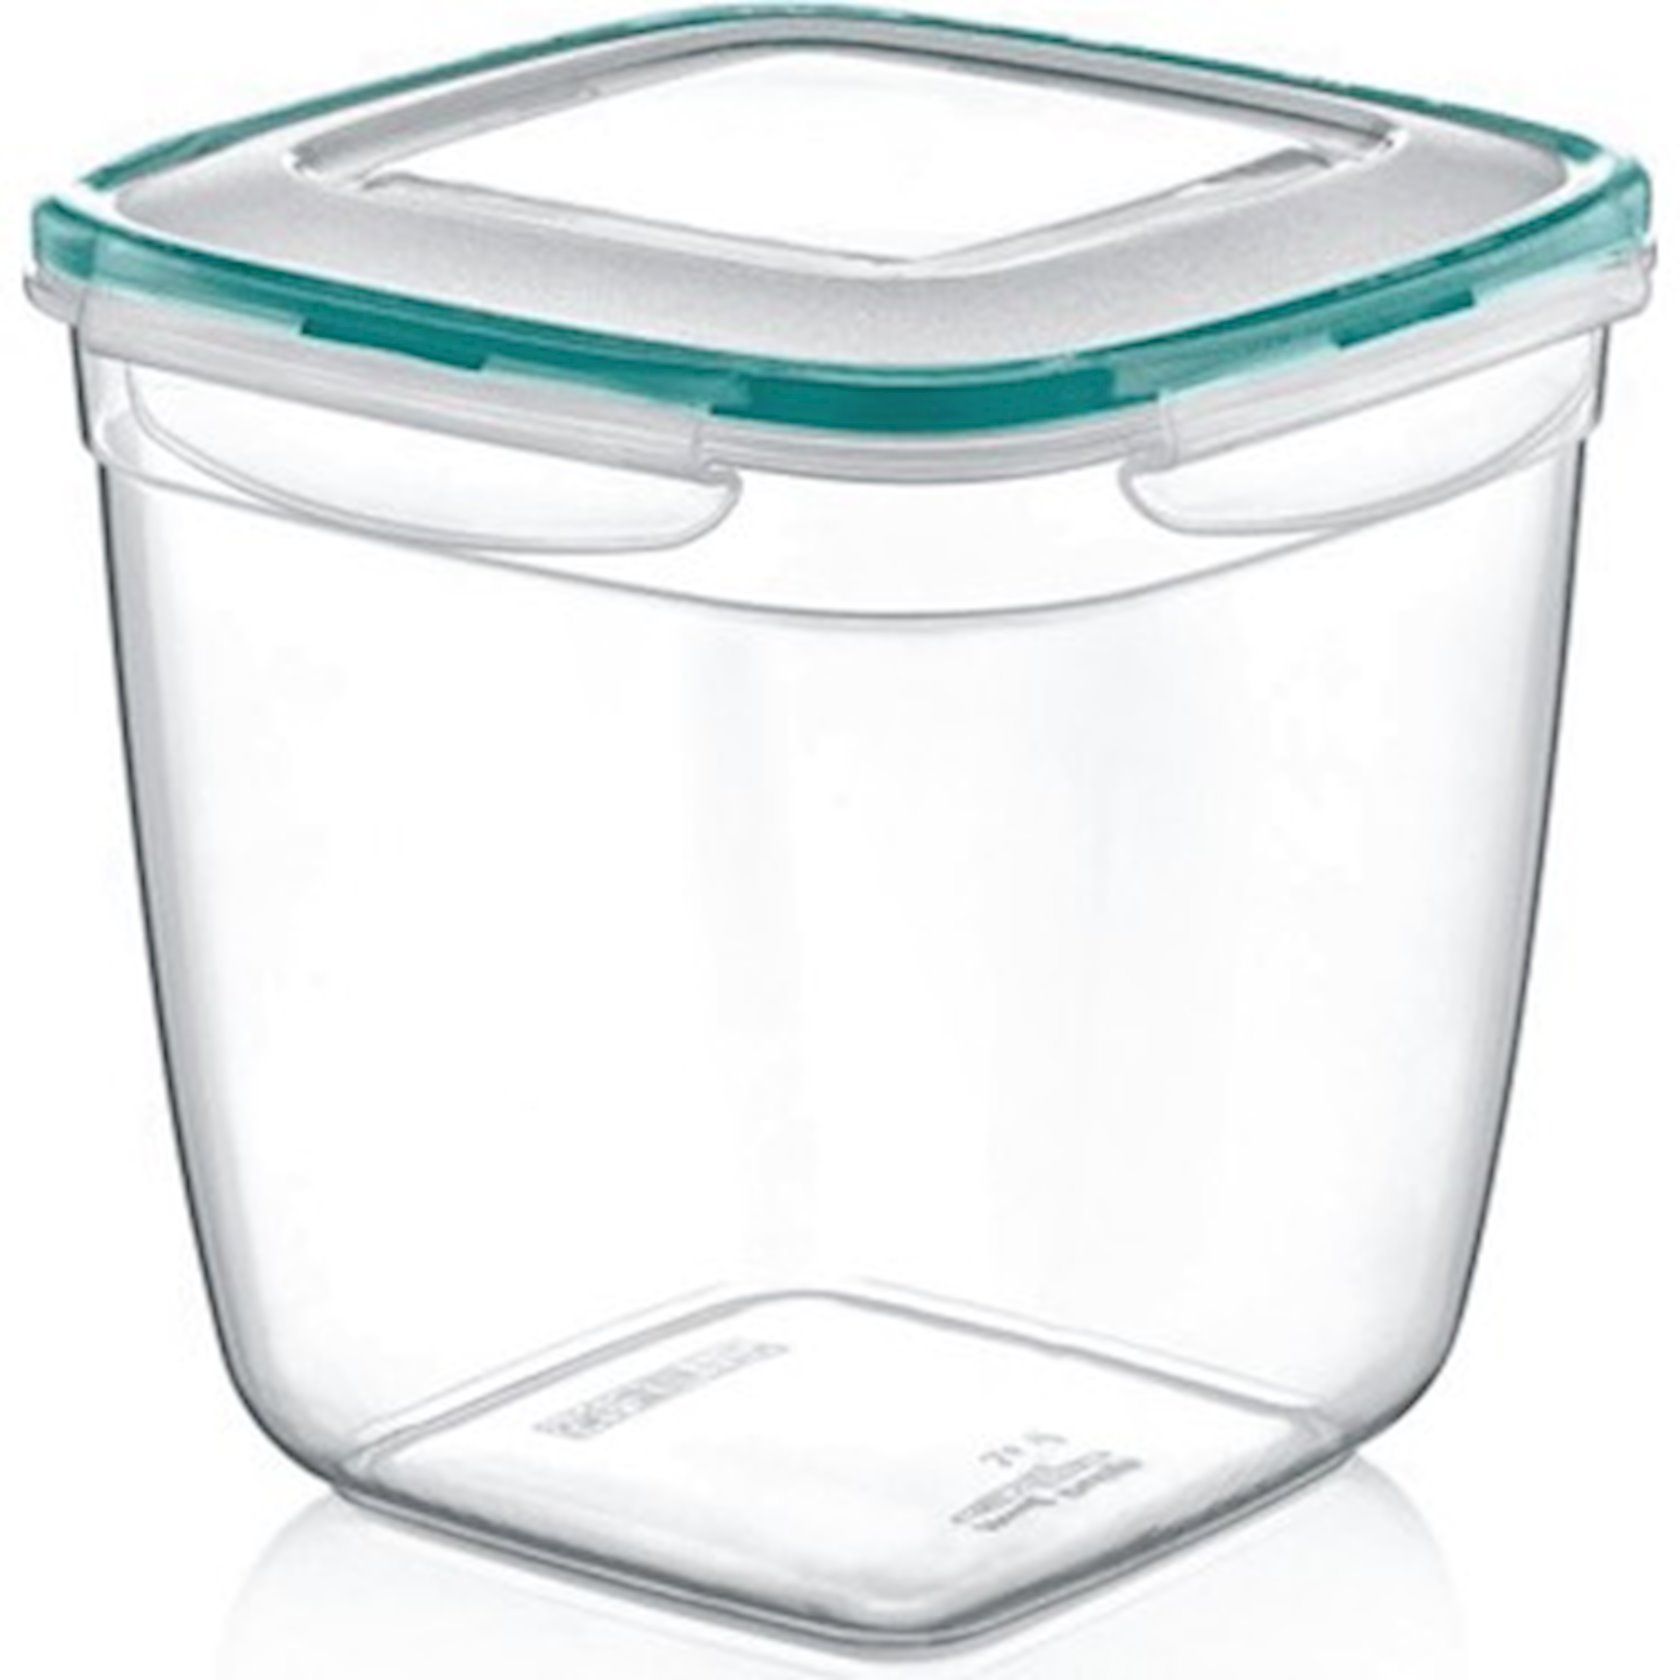 Saxlama qabı Plastart Fresh Box 3.6 l